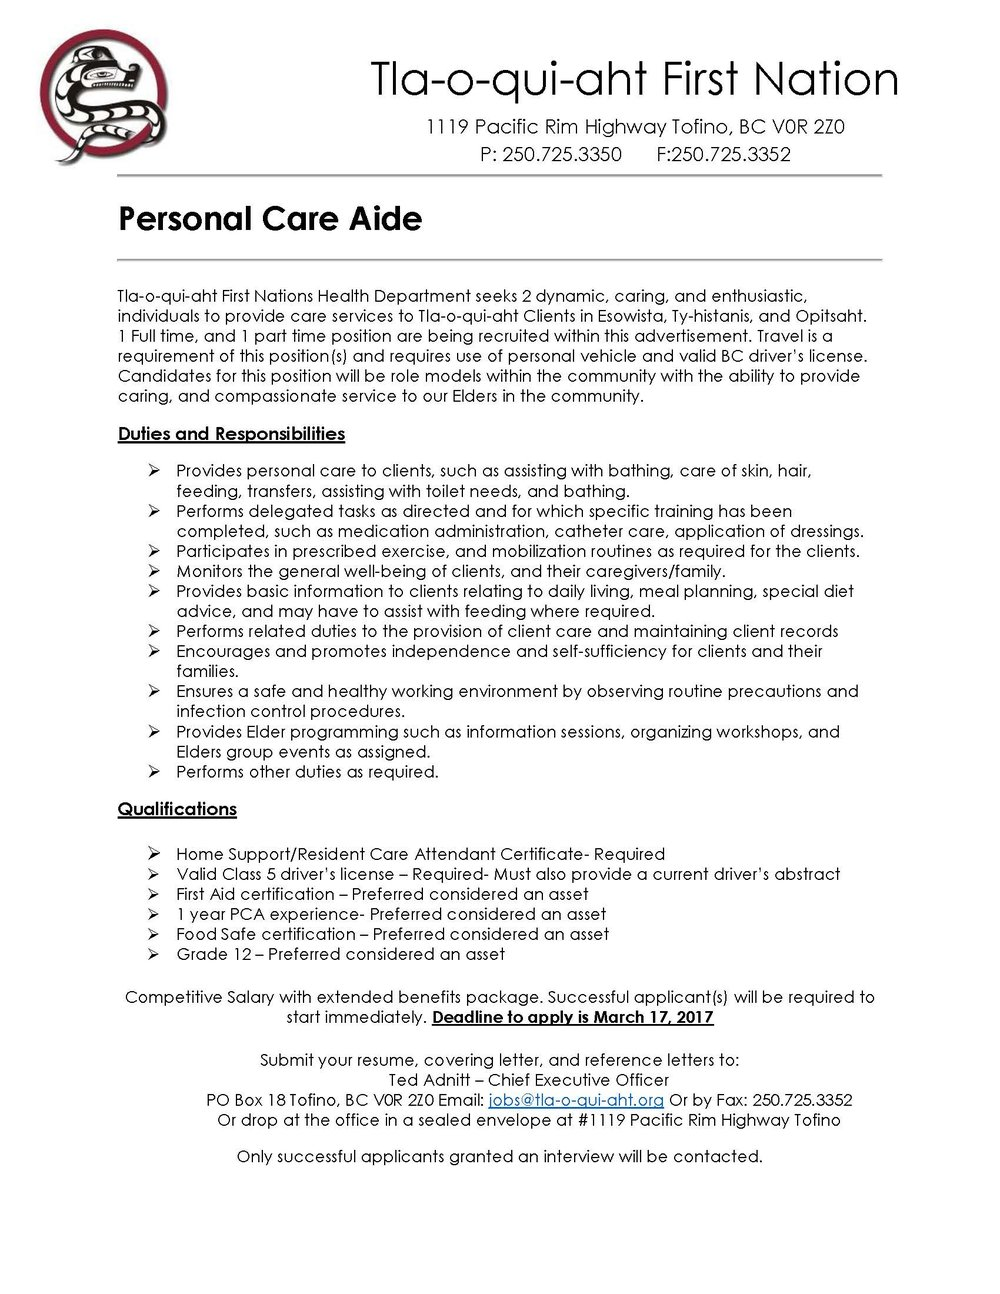 Personal Care Aid Job Postings Tla O Qui Aht First Nation